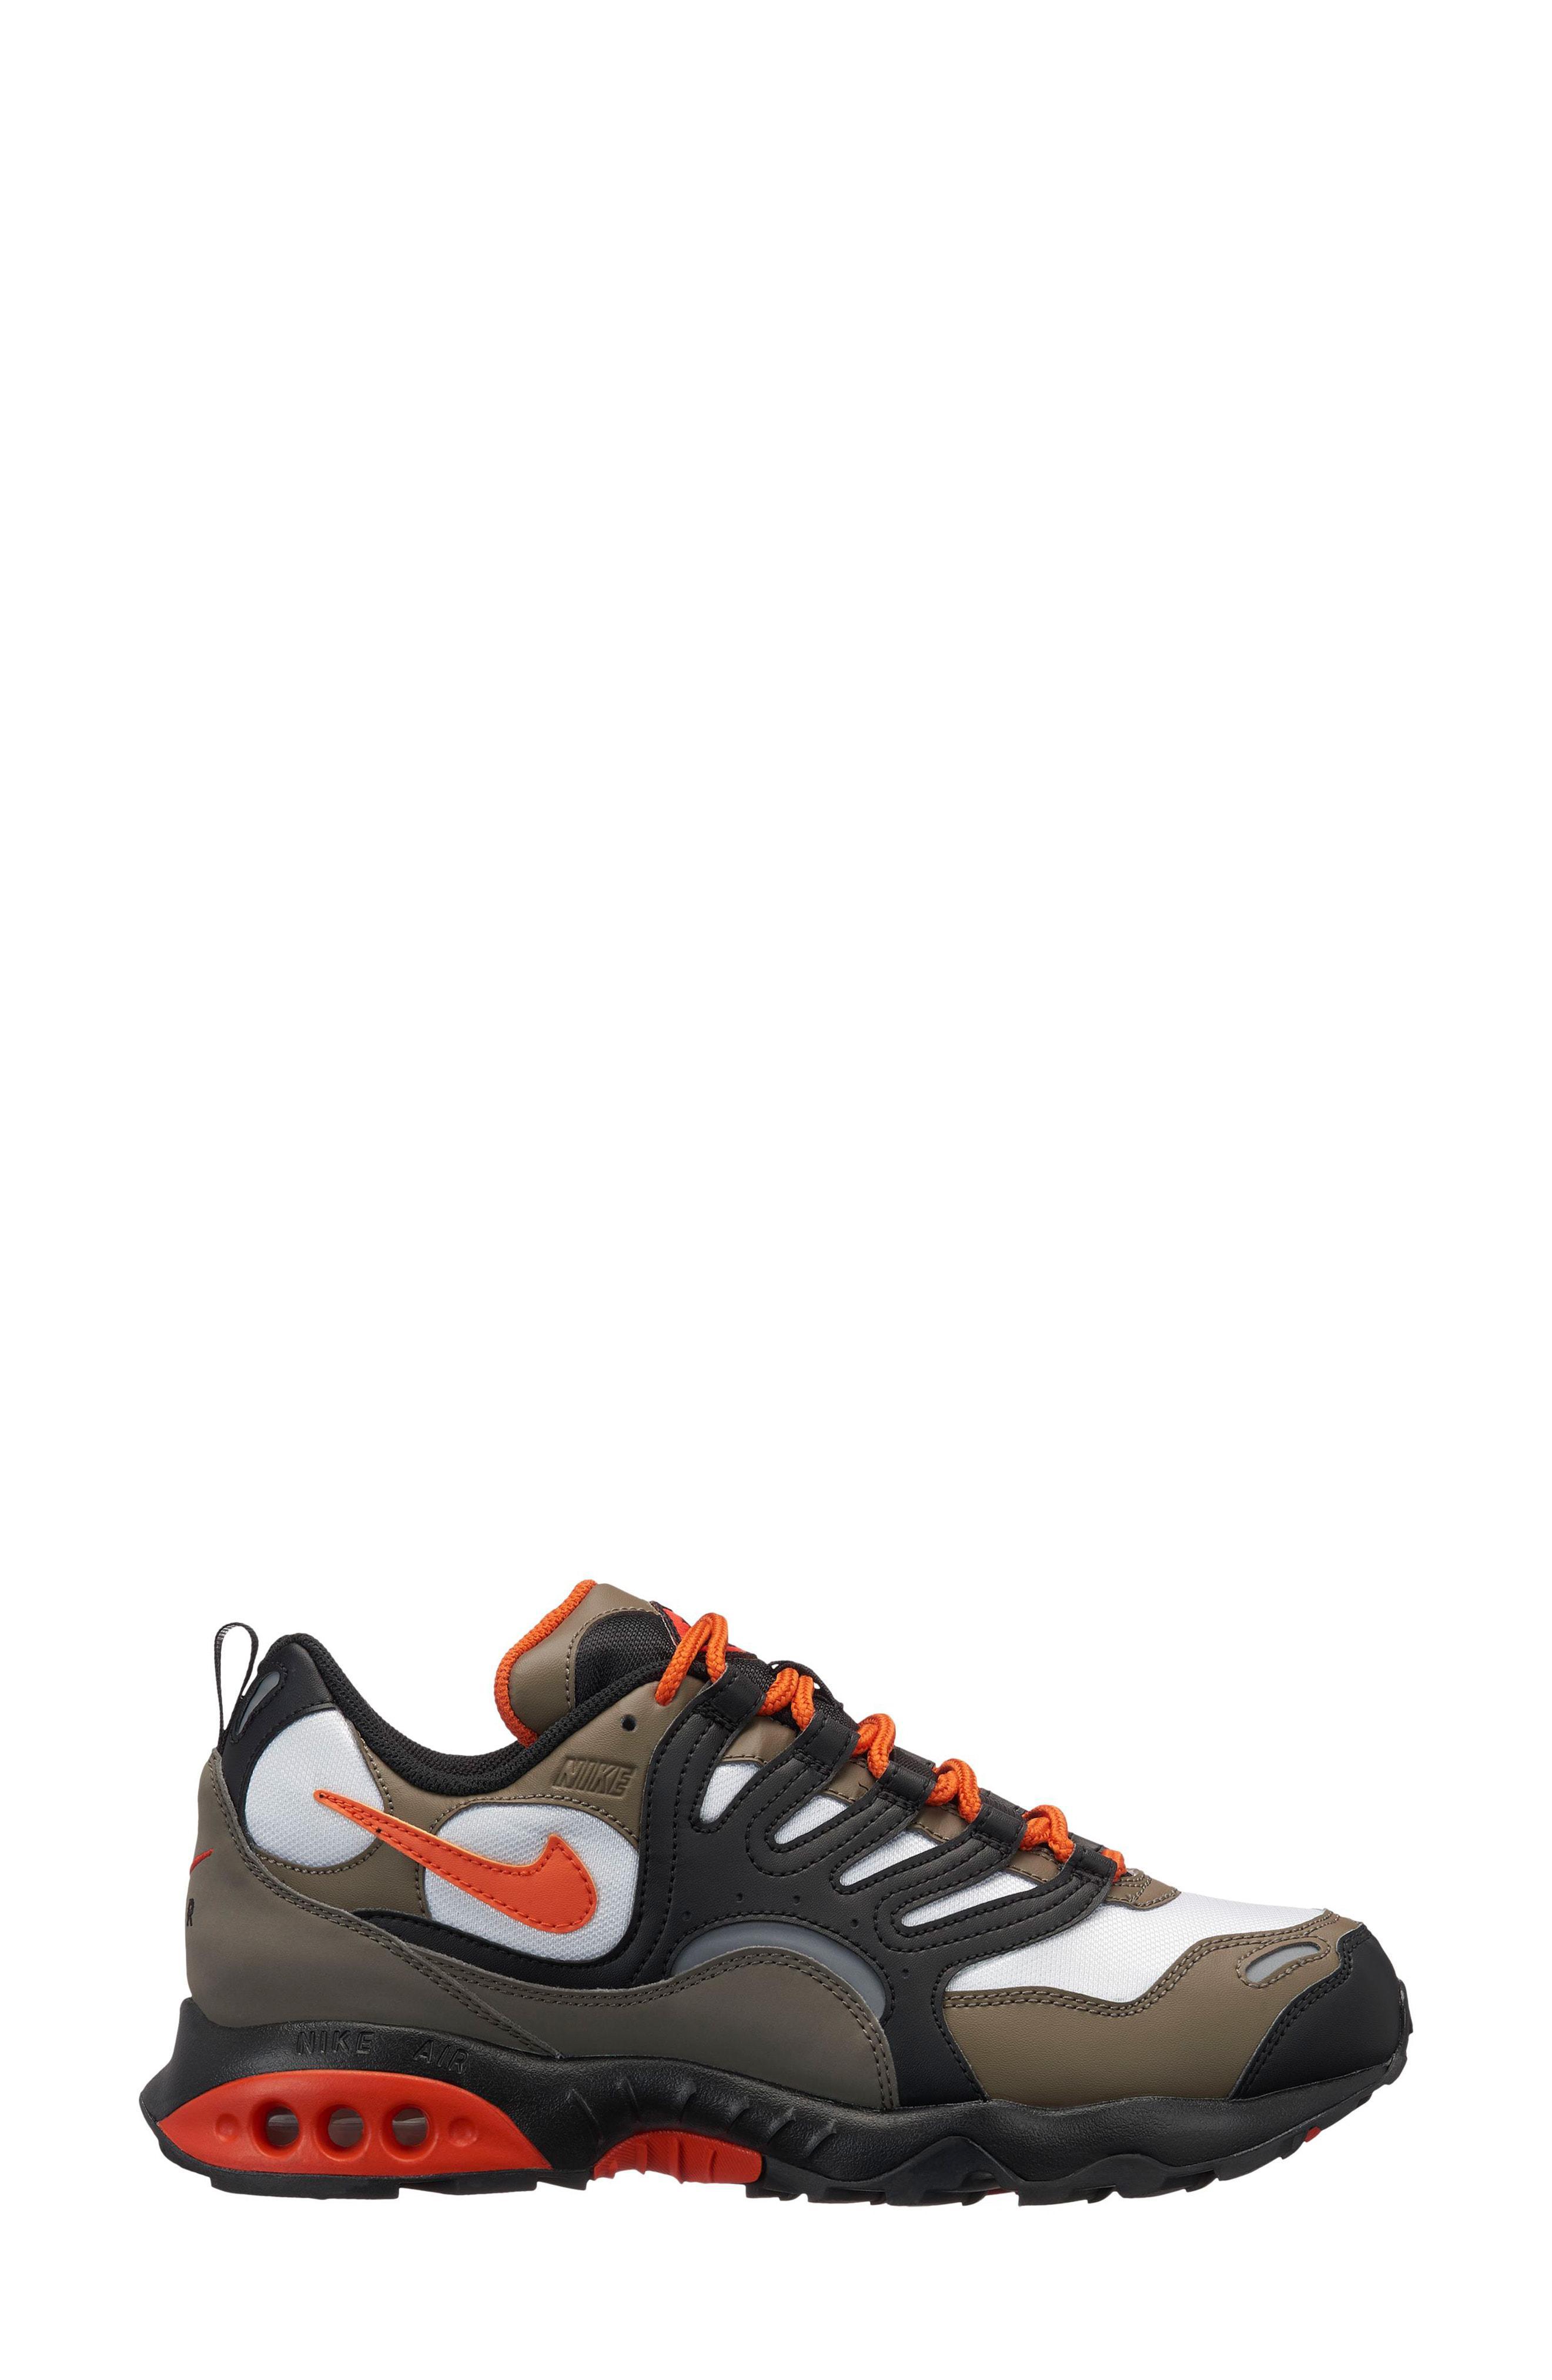 628c97b8ec063a Lyst - Nike Air Terra Humara  18 Sneaker for Men